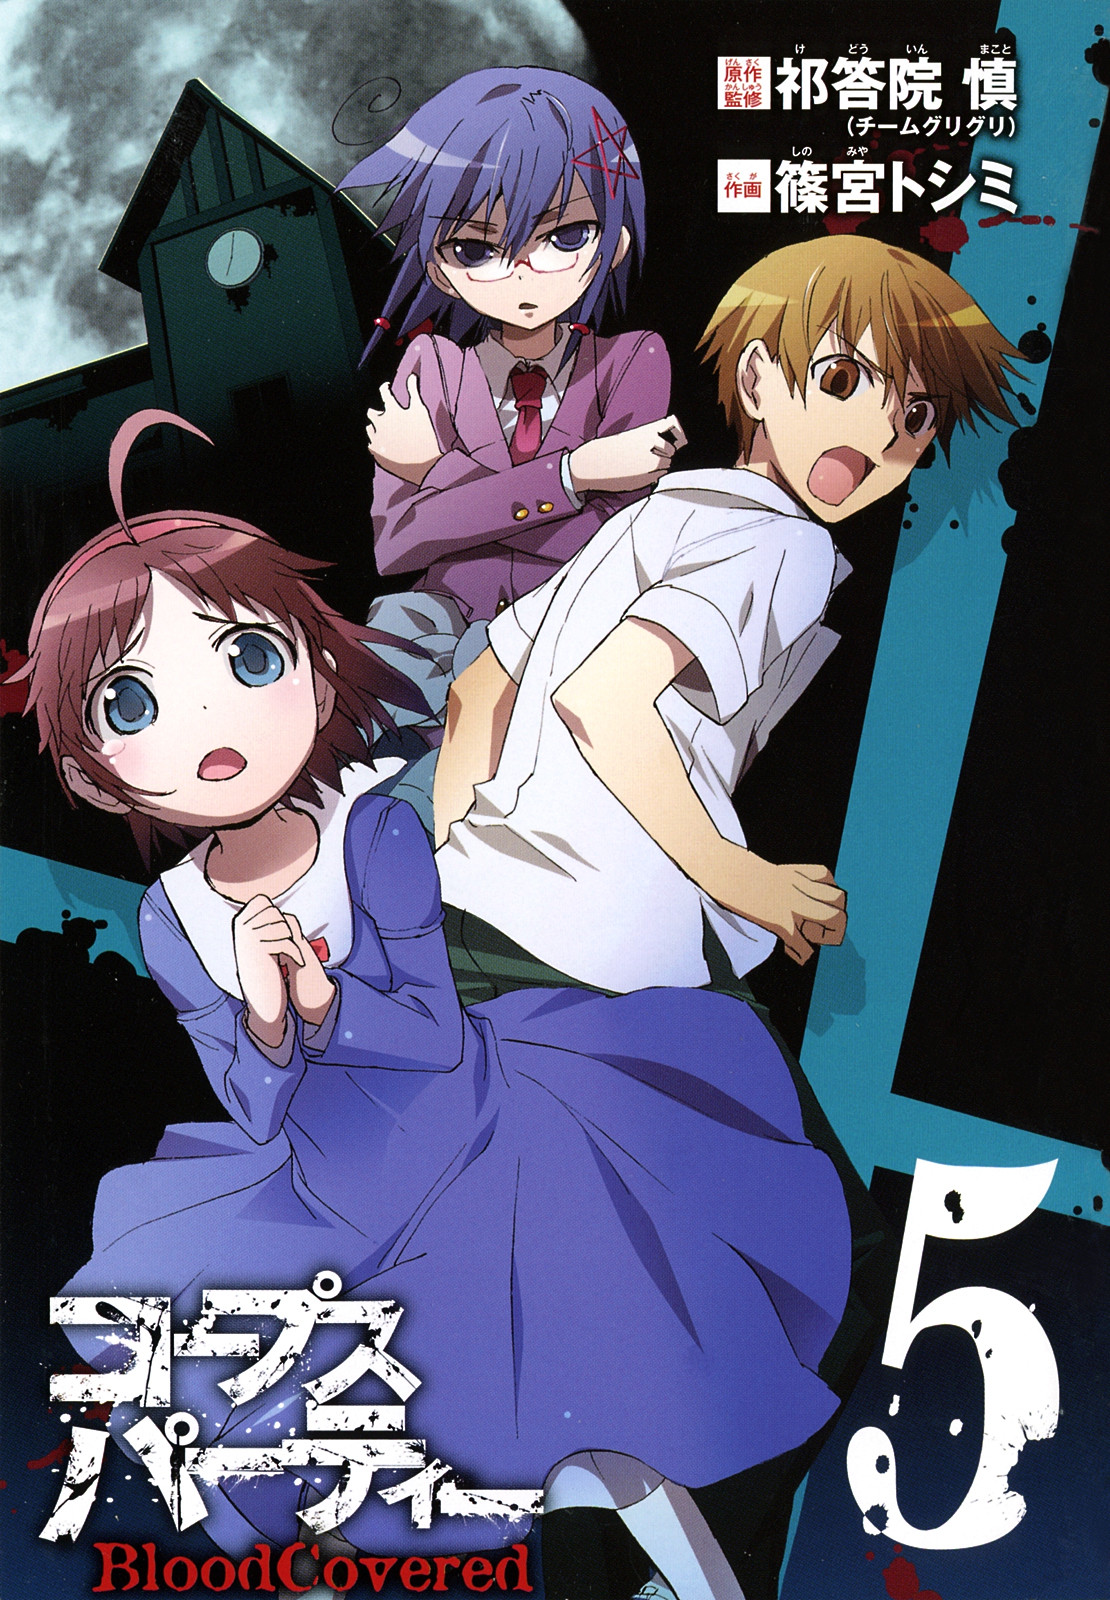 Corpse Party Mobile Wallpaper 712659 Zerochan Anime Image Board